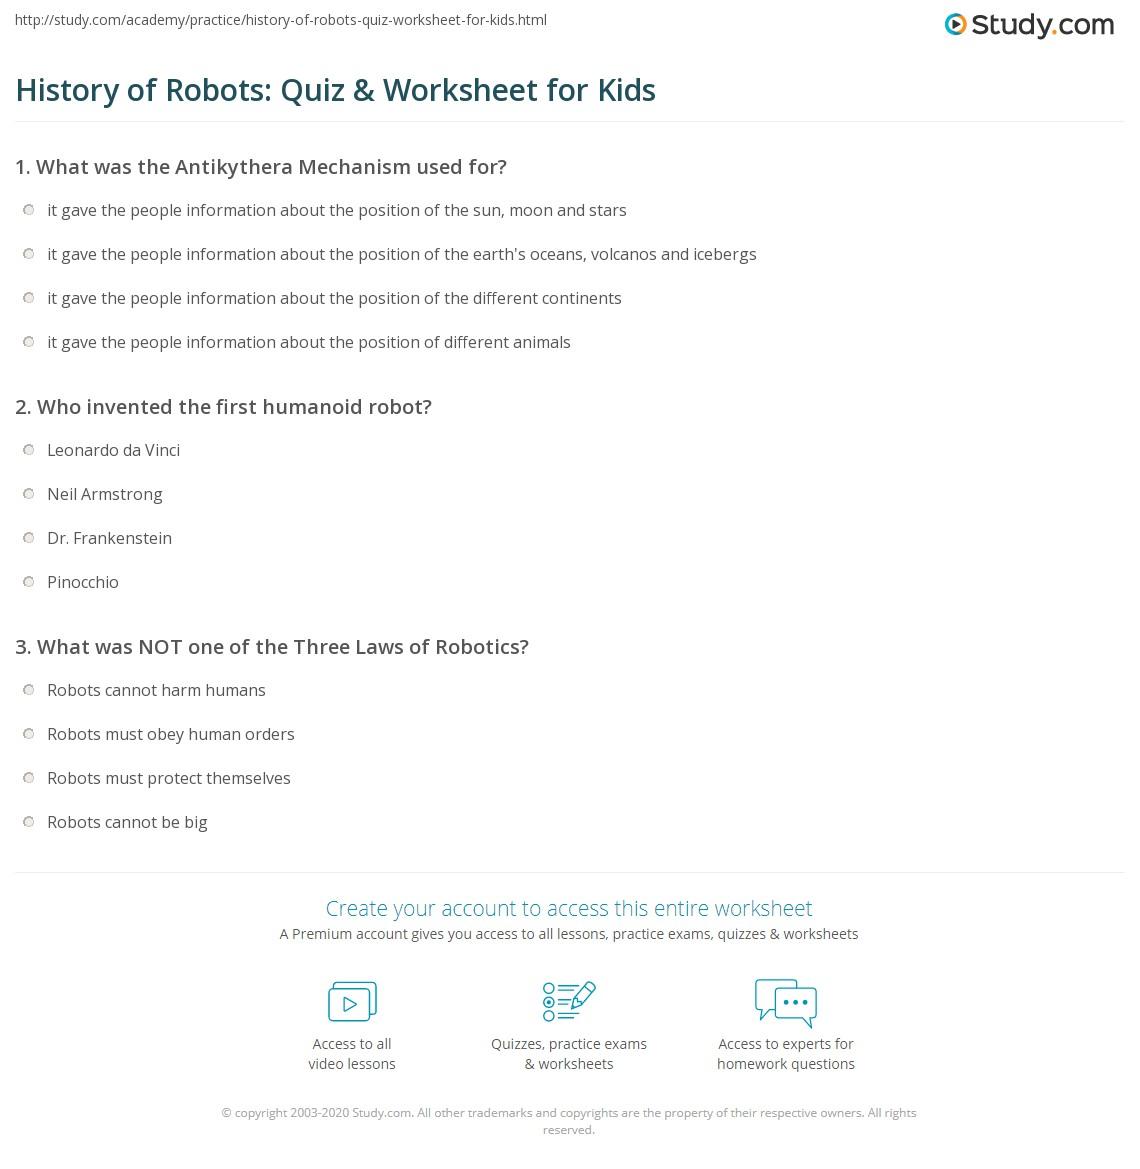 History of Robots: Quiz & Worksheet for Kids | Study com